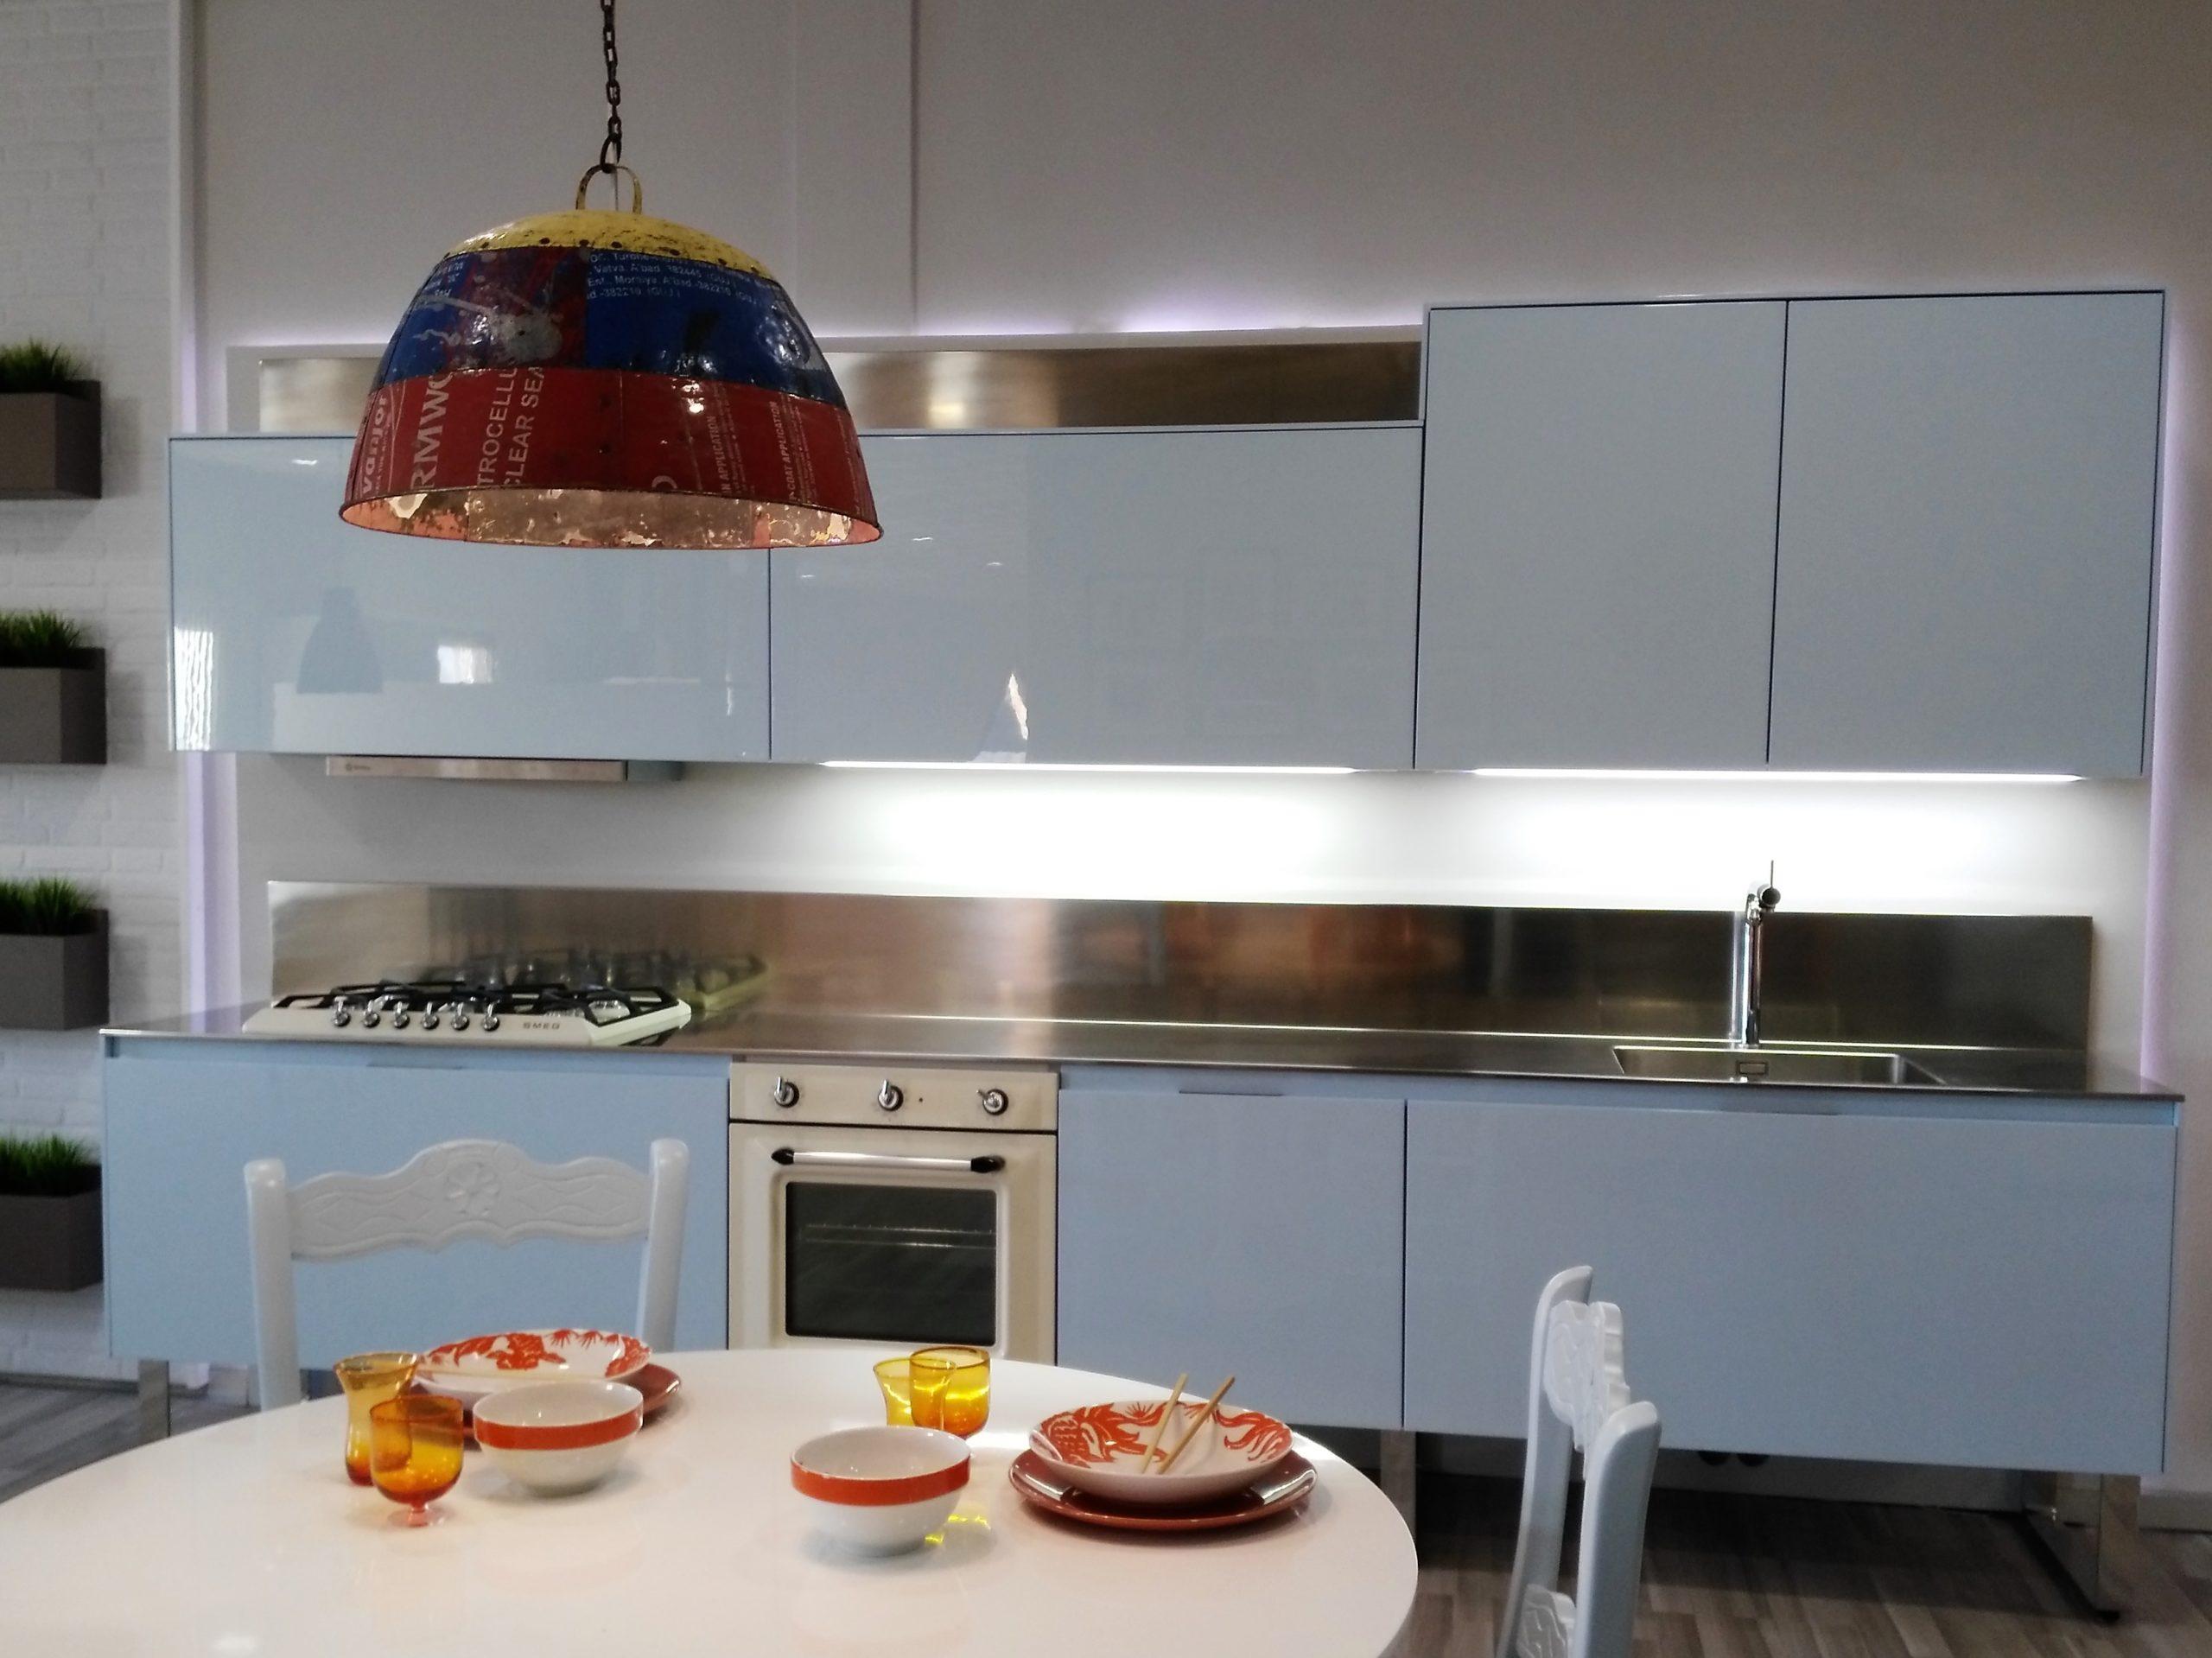 Cocina vintage - Diseño e instalación de cocinas - Idecocina